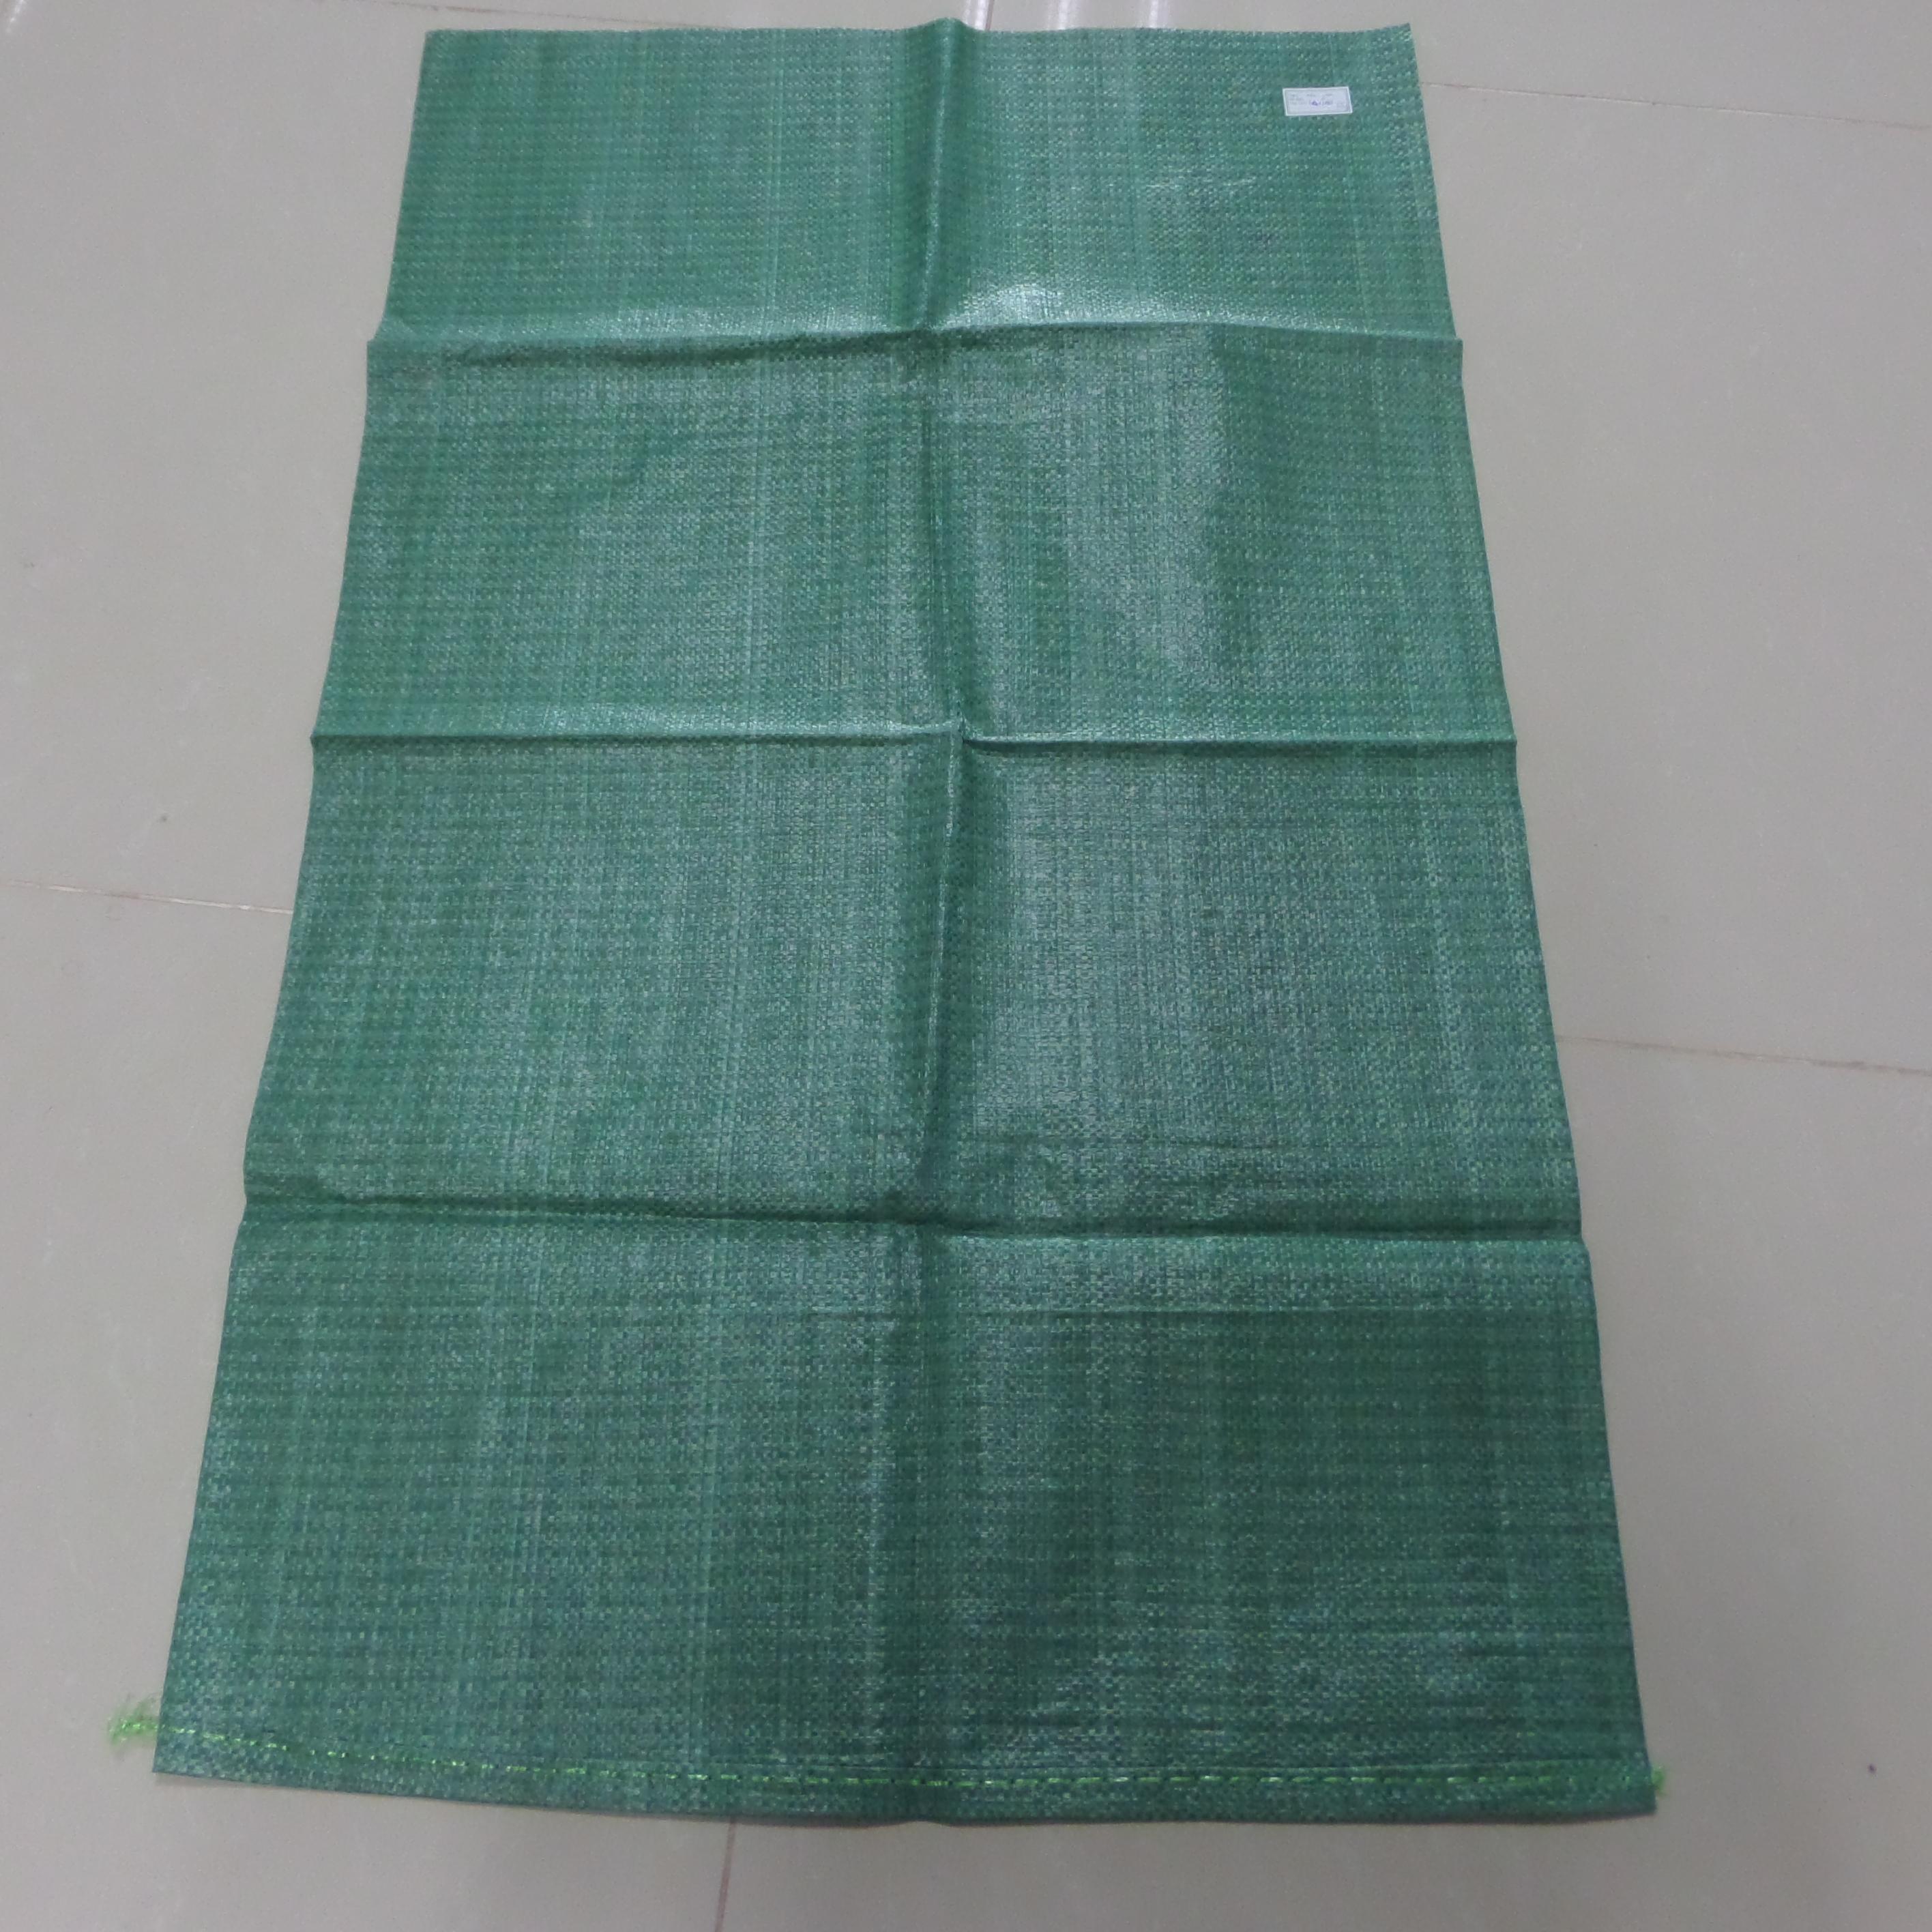 Bao xanh cốm Kt : 62 *102 / 53(g/m2)